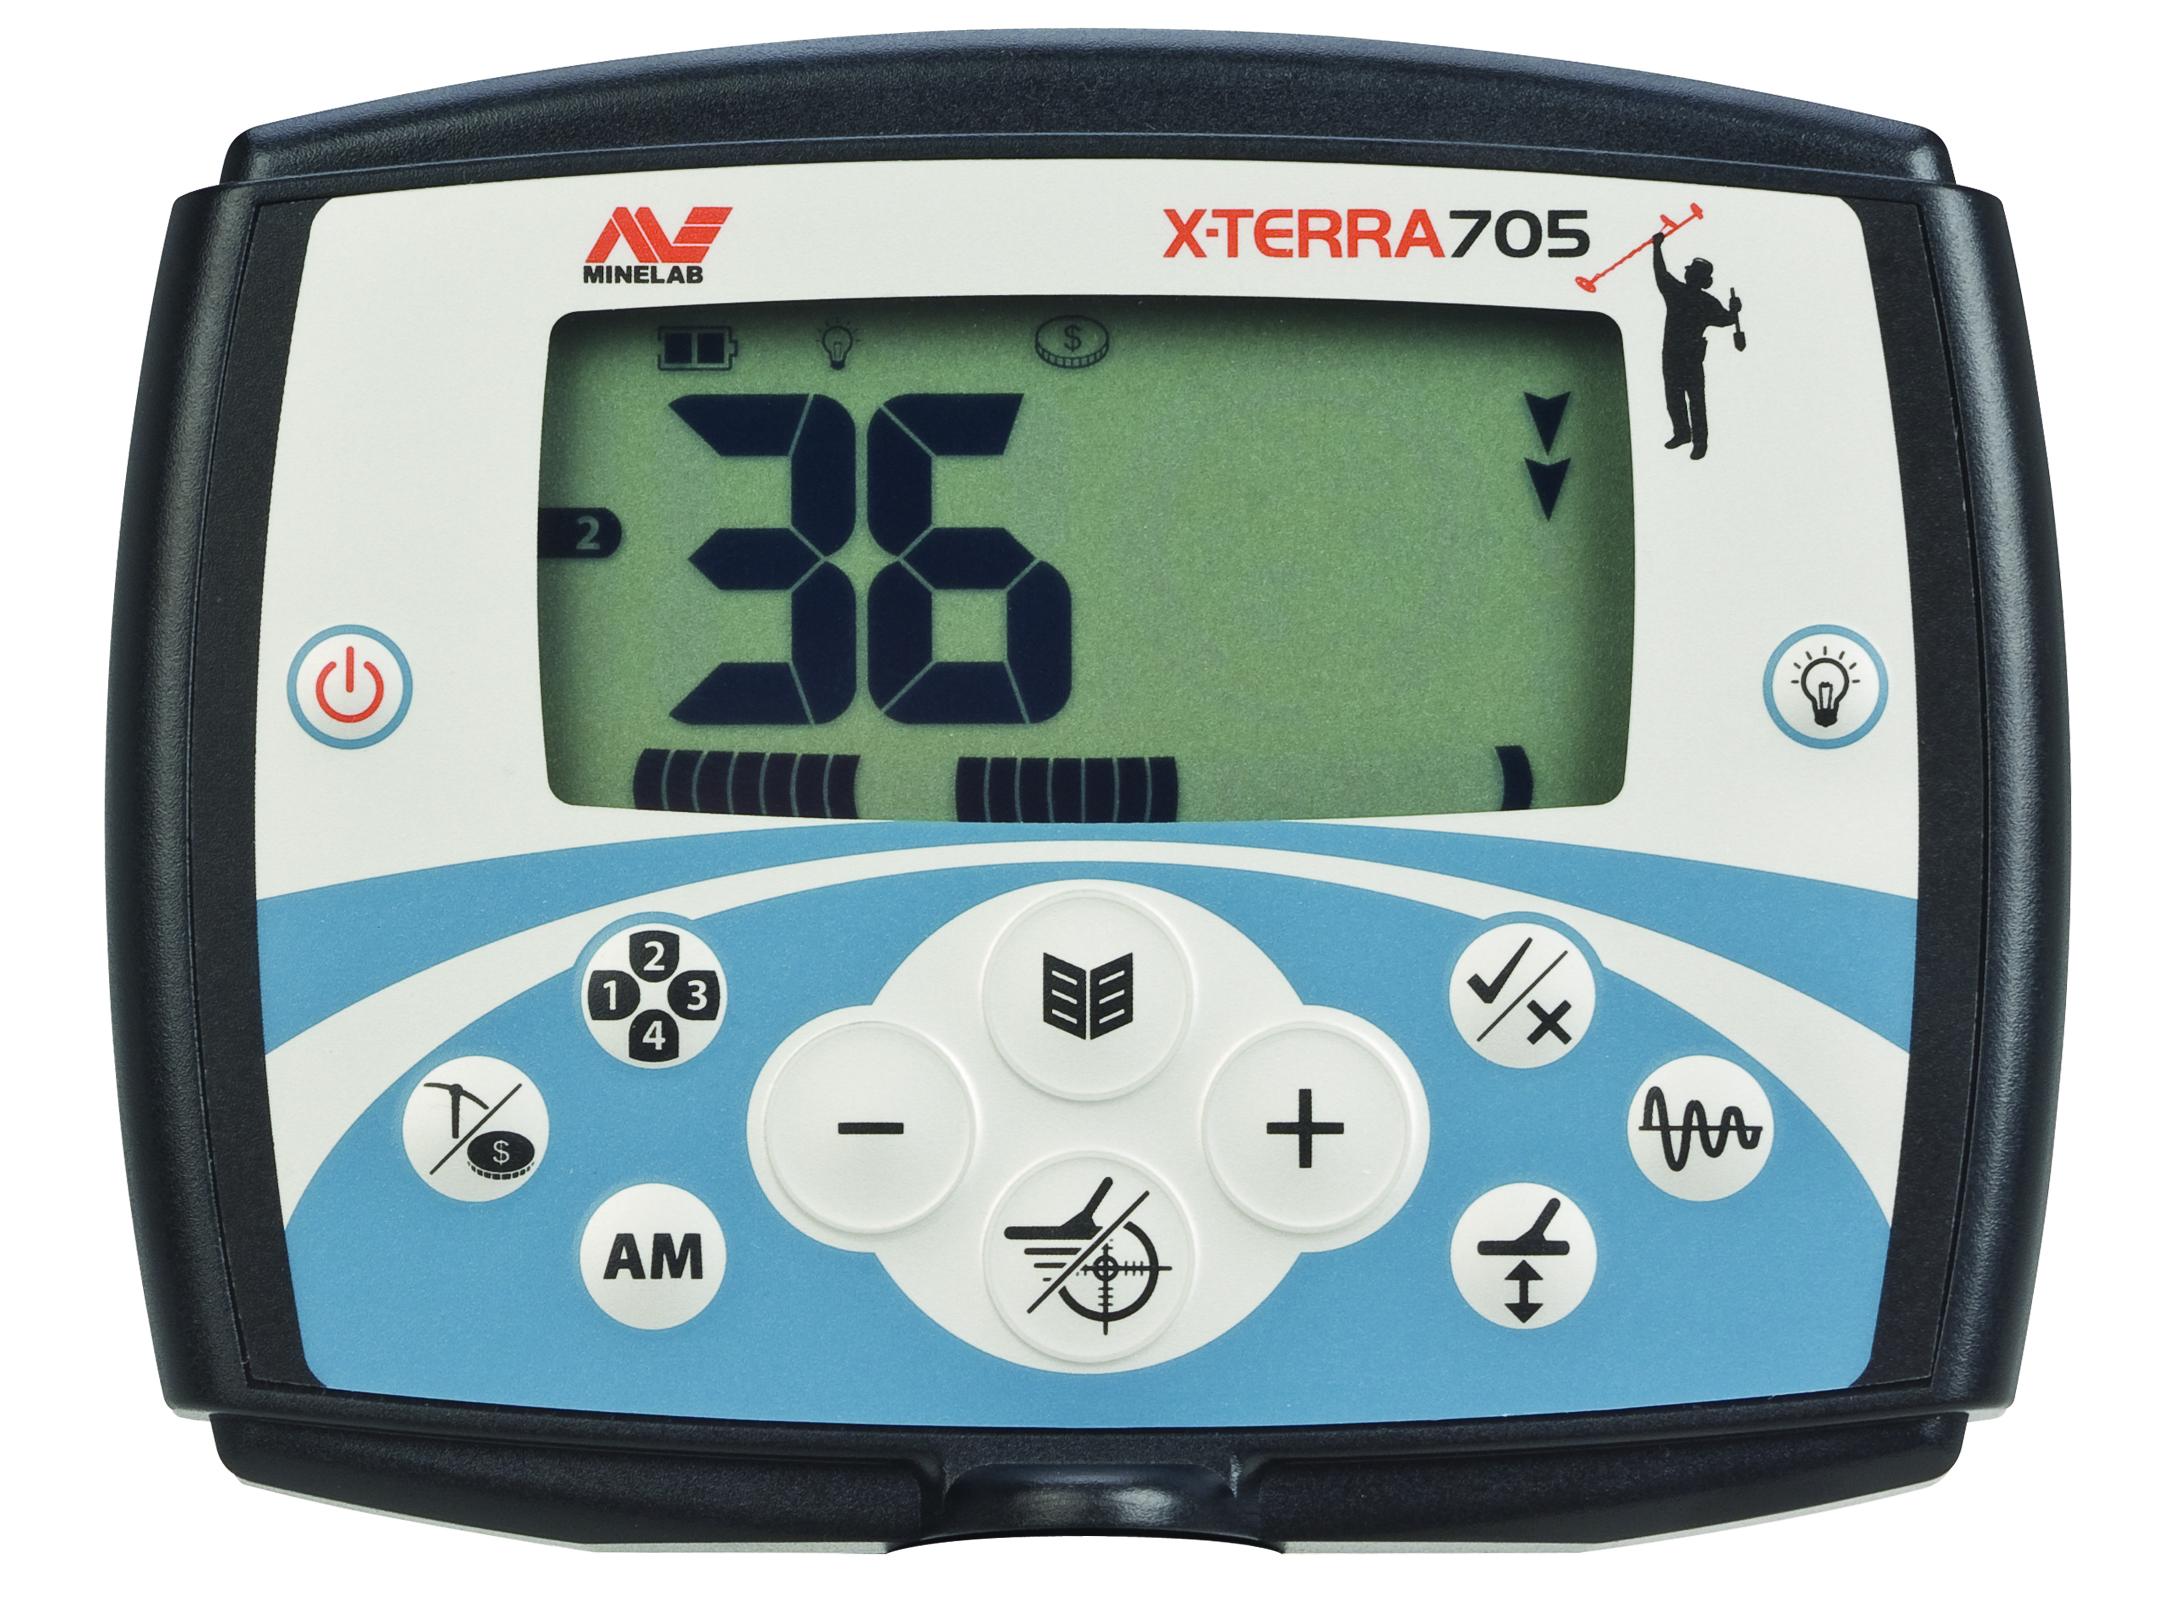 Minelab X-TERRA 705 Metal Detector